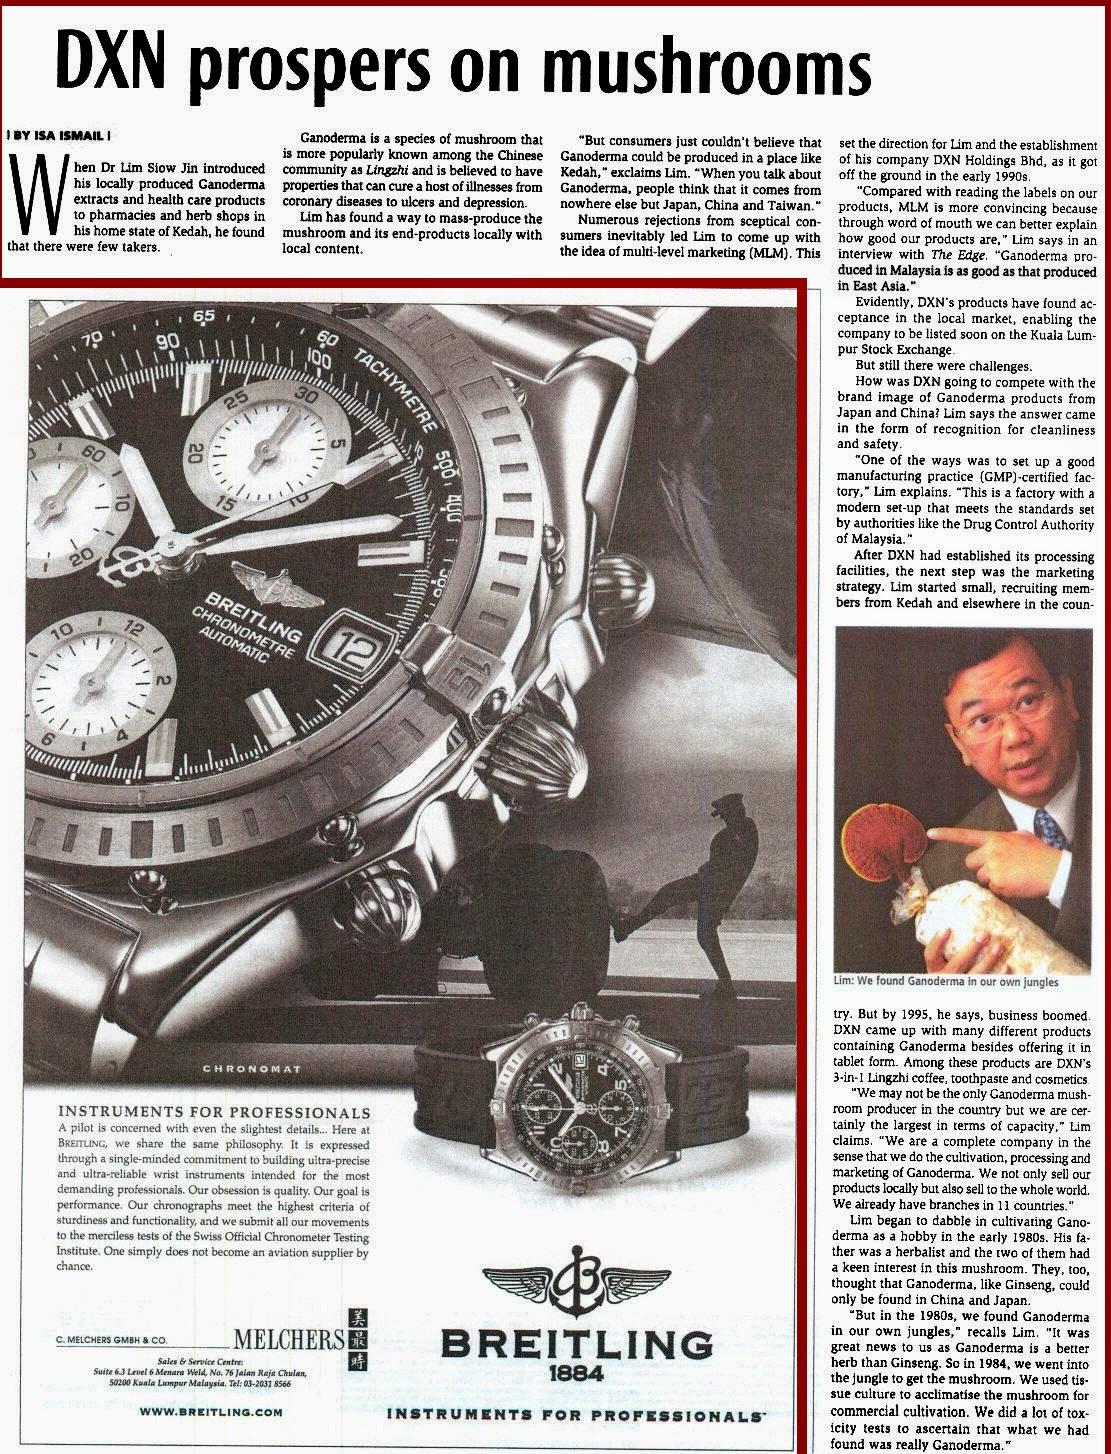 DXN - News of Ganoderma